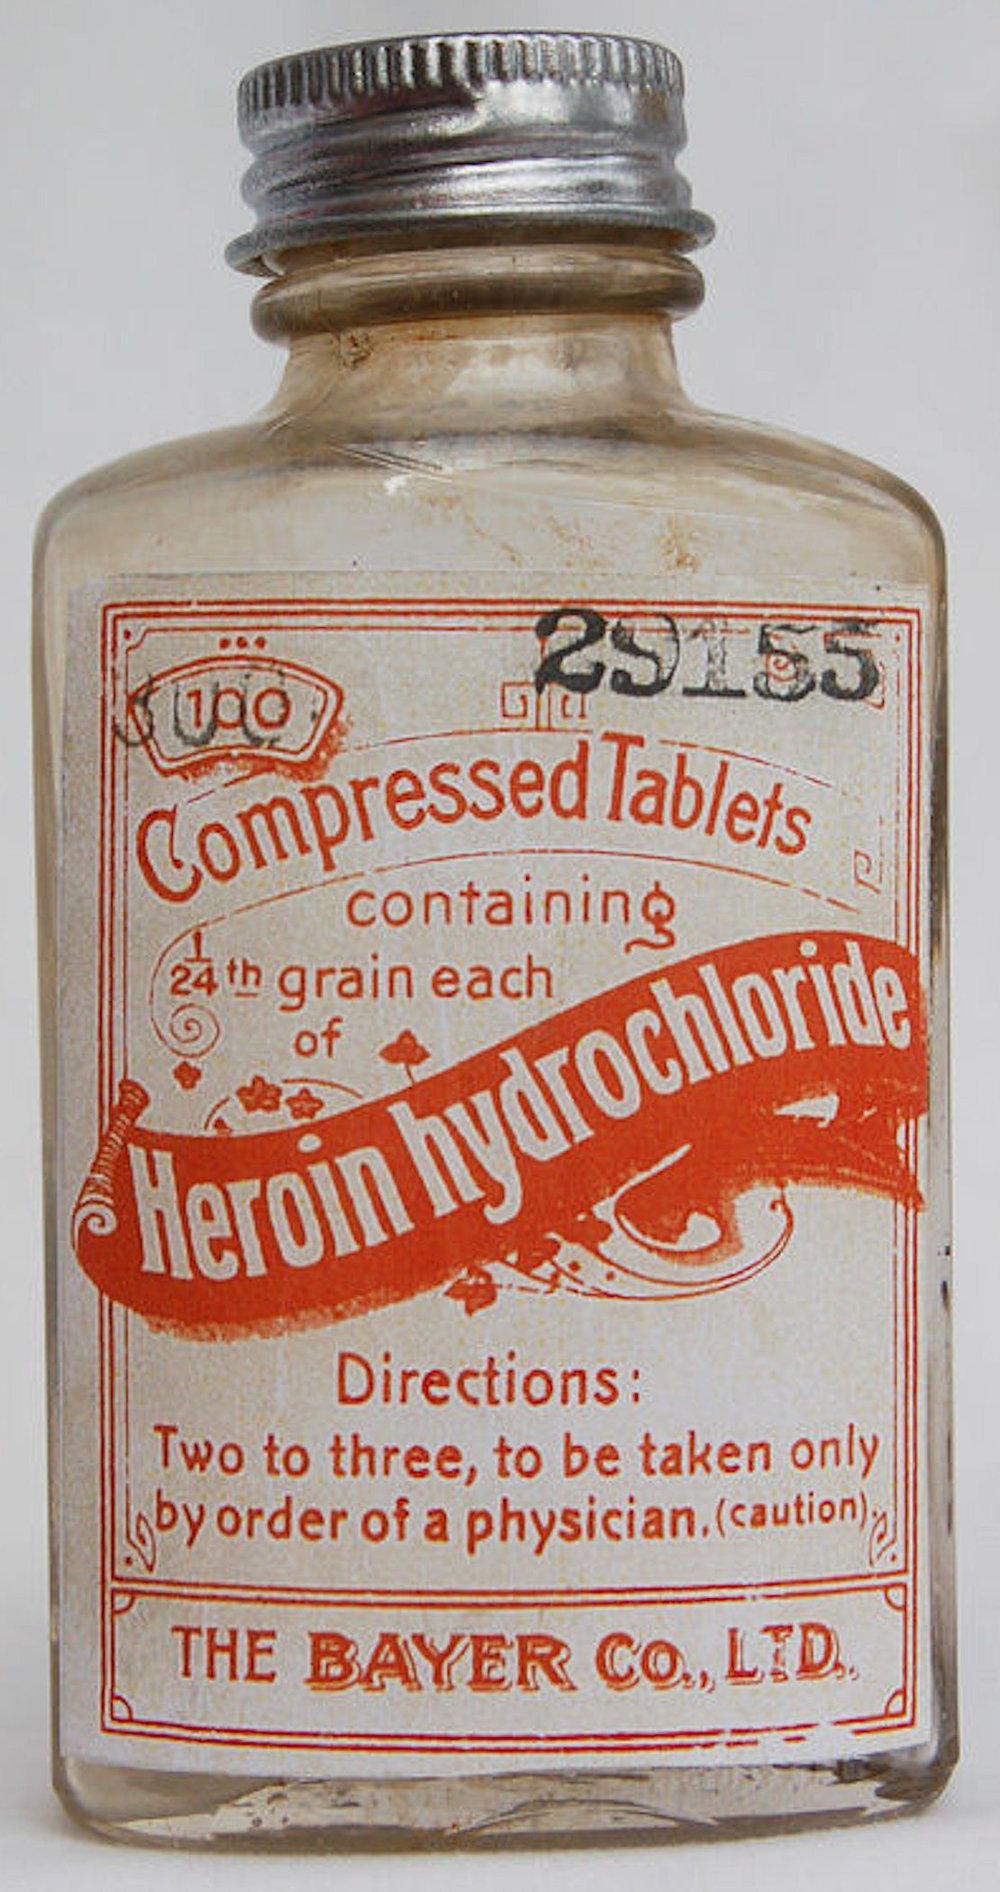 Medecine Label 2.jpg